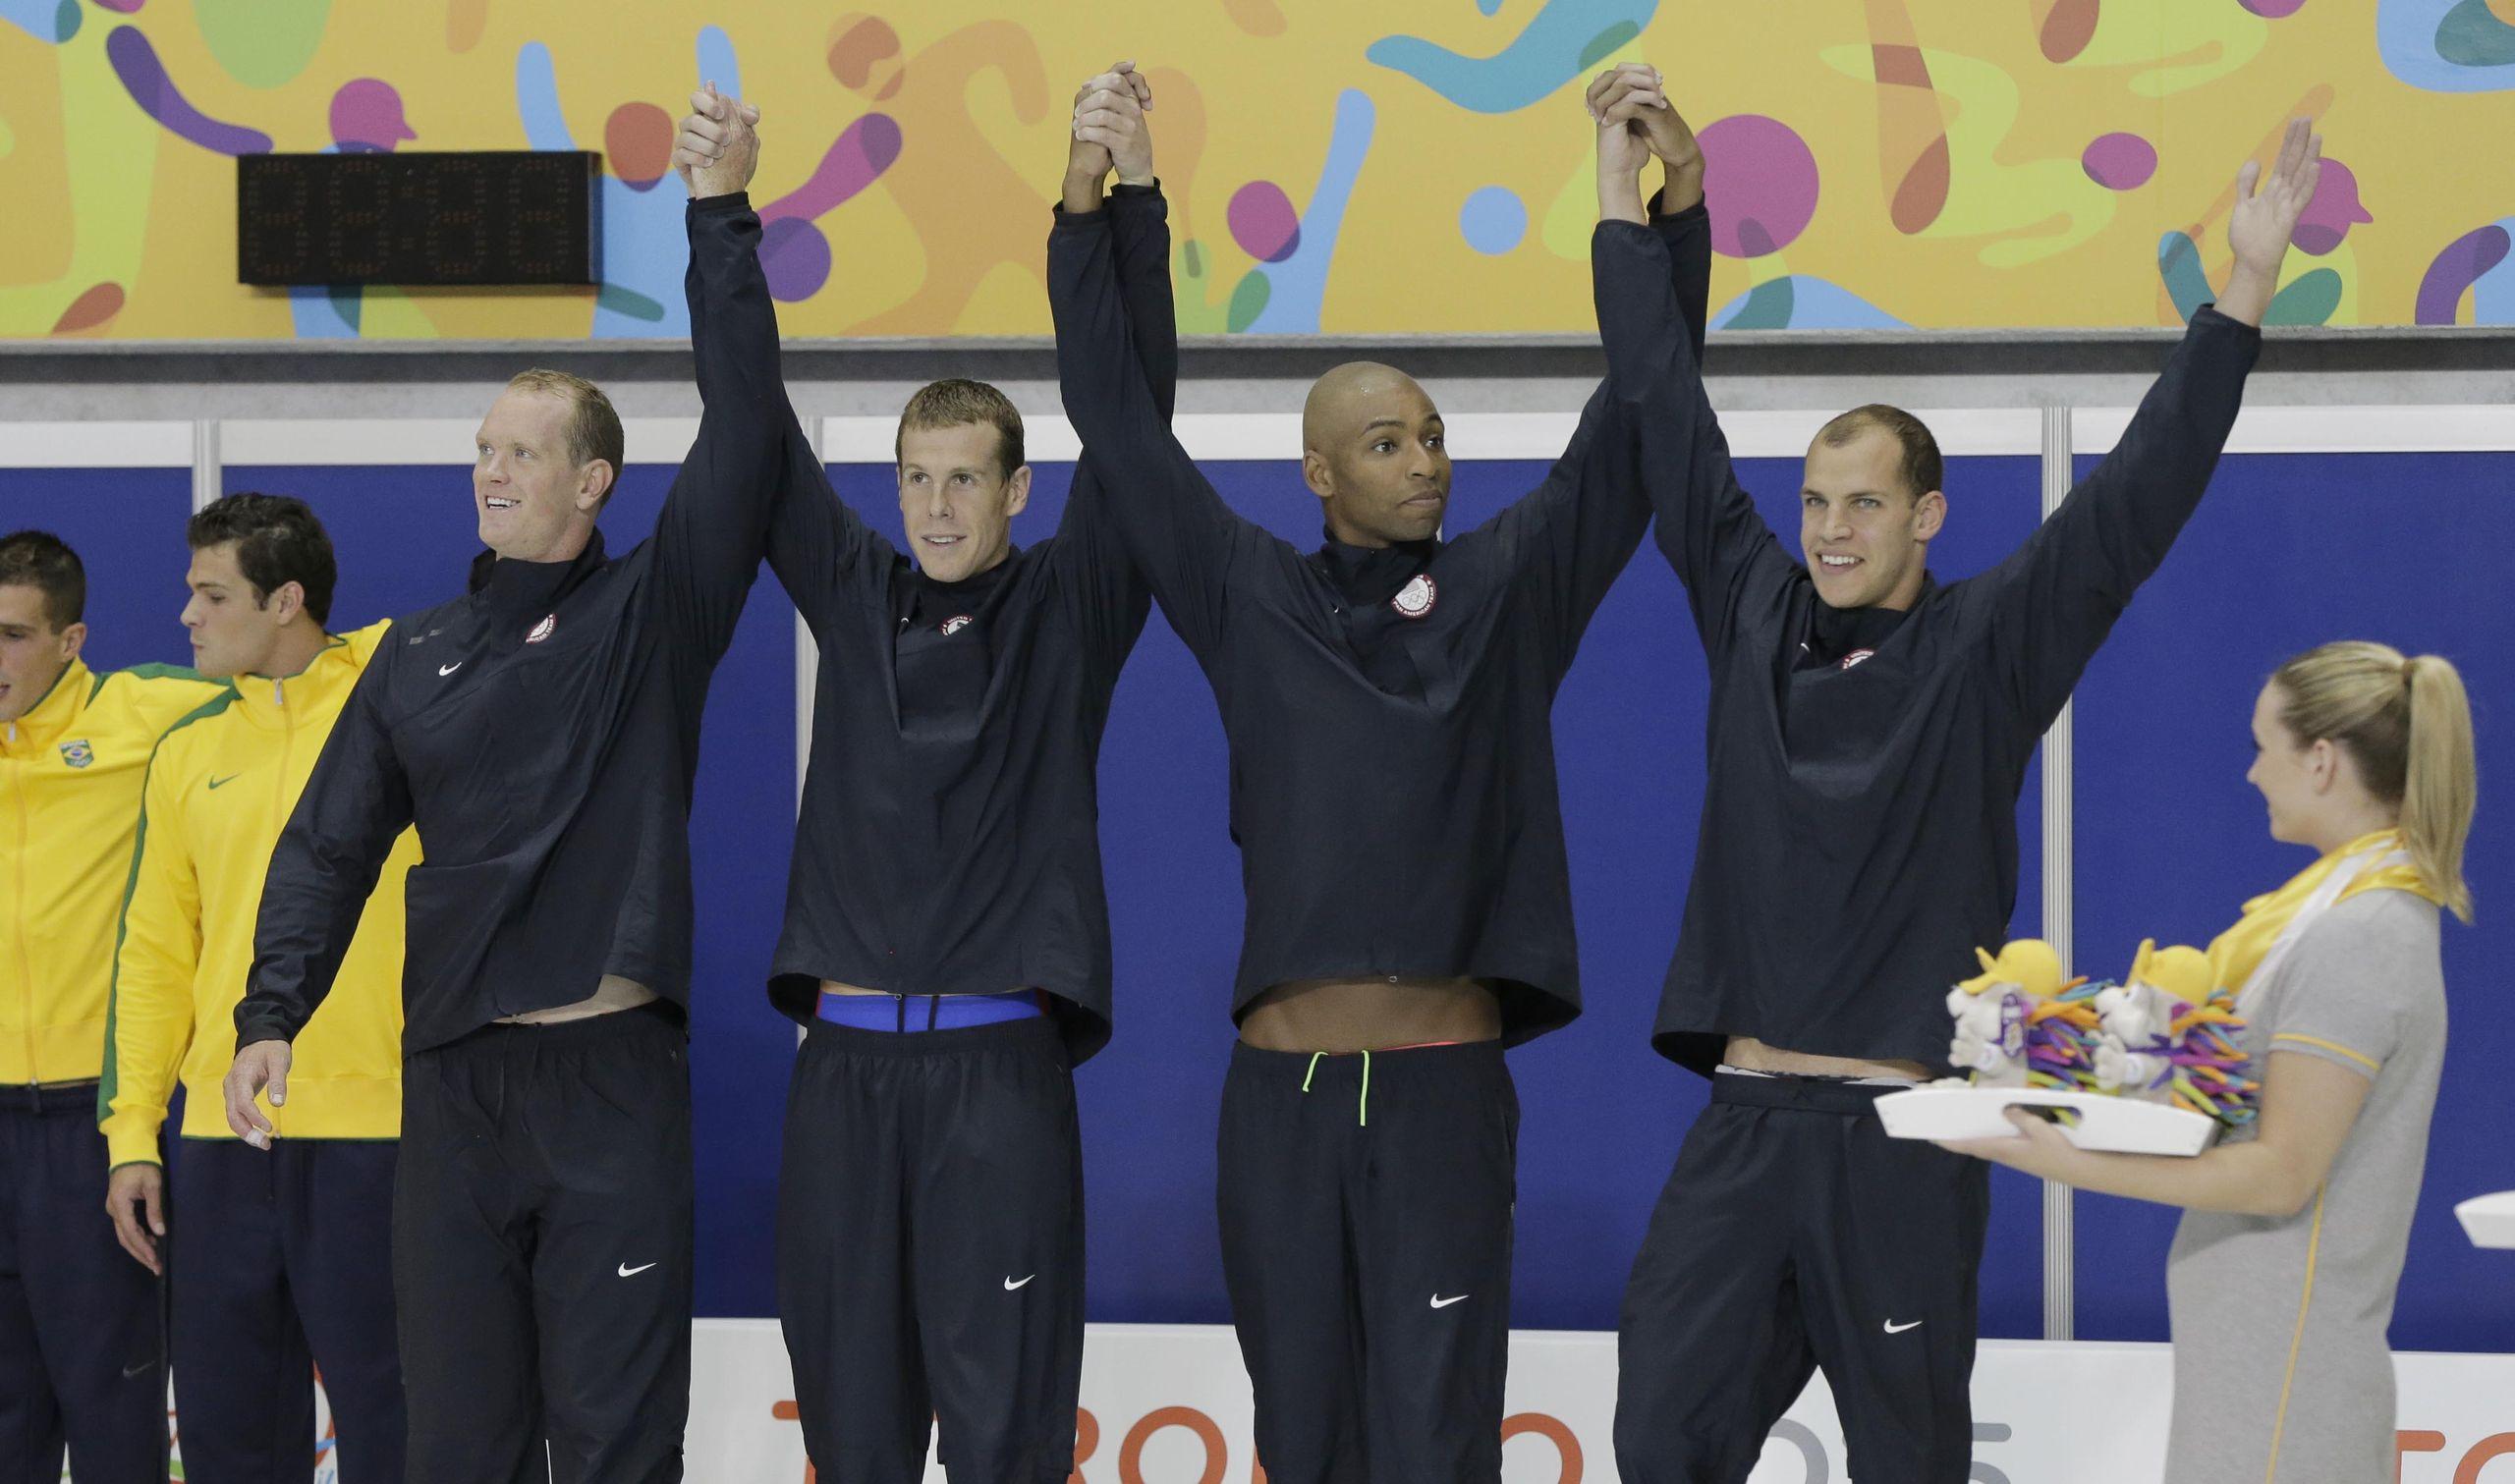 pan american games swimming day finals photo gallery jul 14 2015 toronto ontario can josh schneider darian townsend